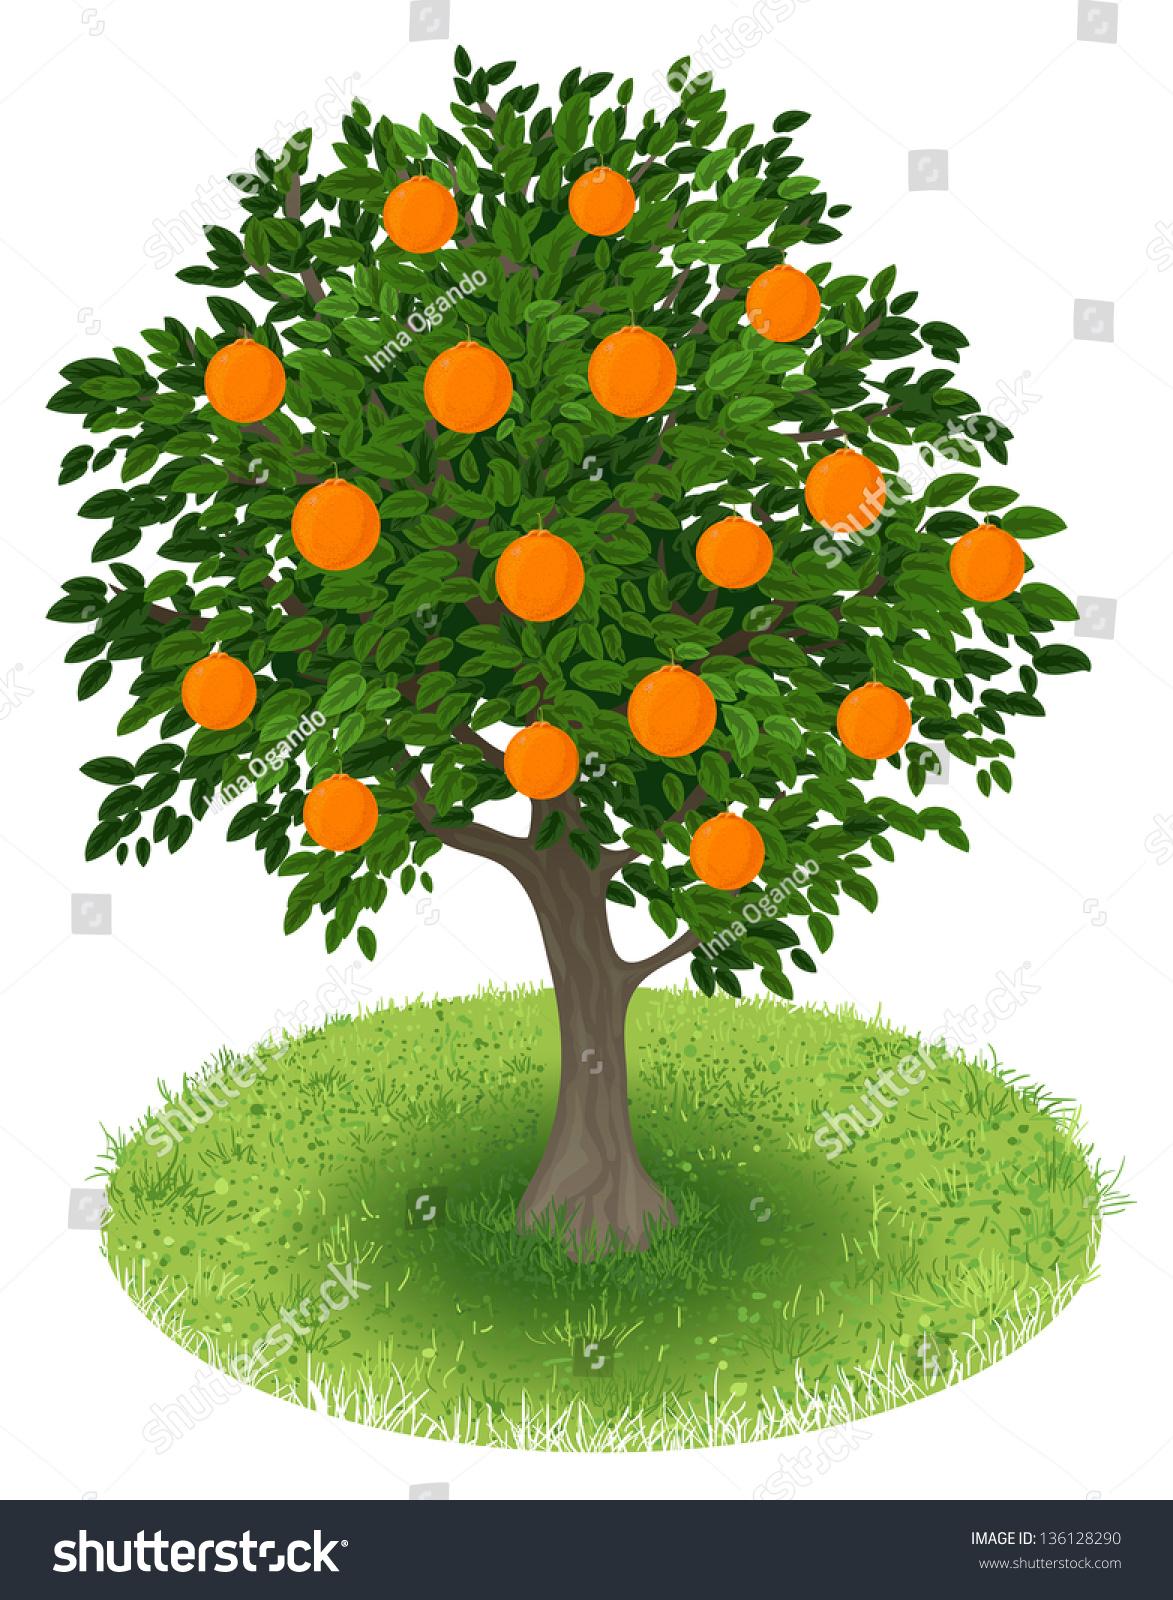 Summer orange tree with orange fruits in green field illustration